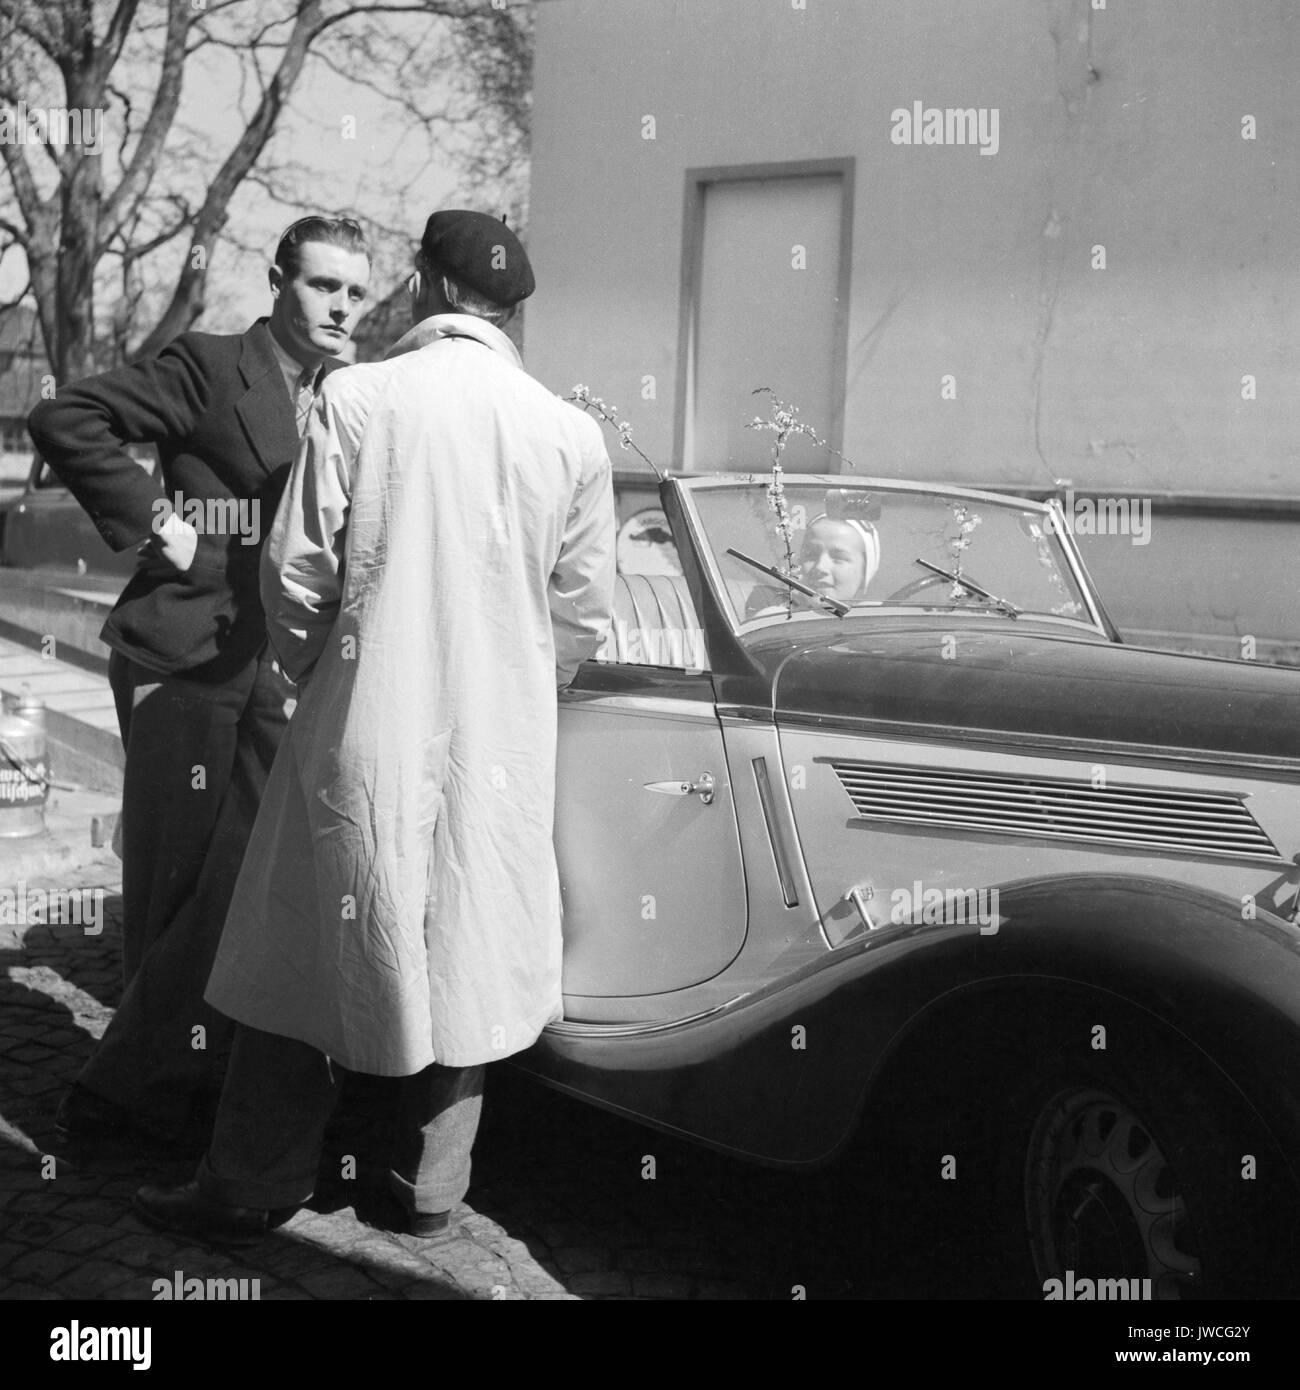 Two men talking beside parked car. - Stock Image